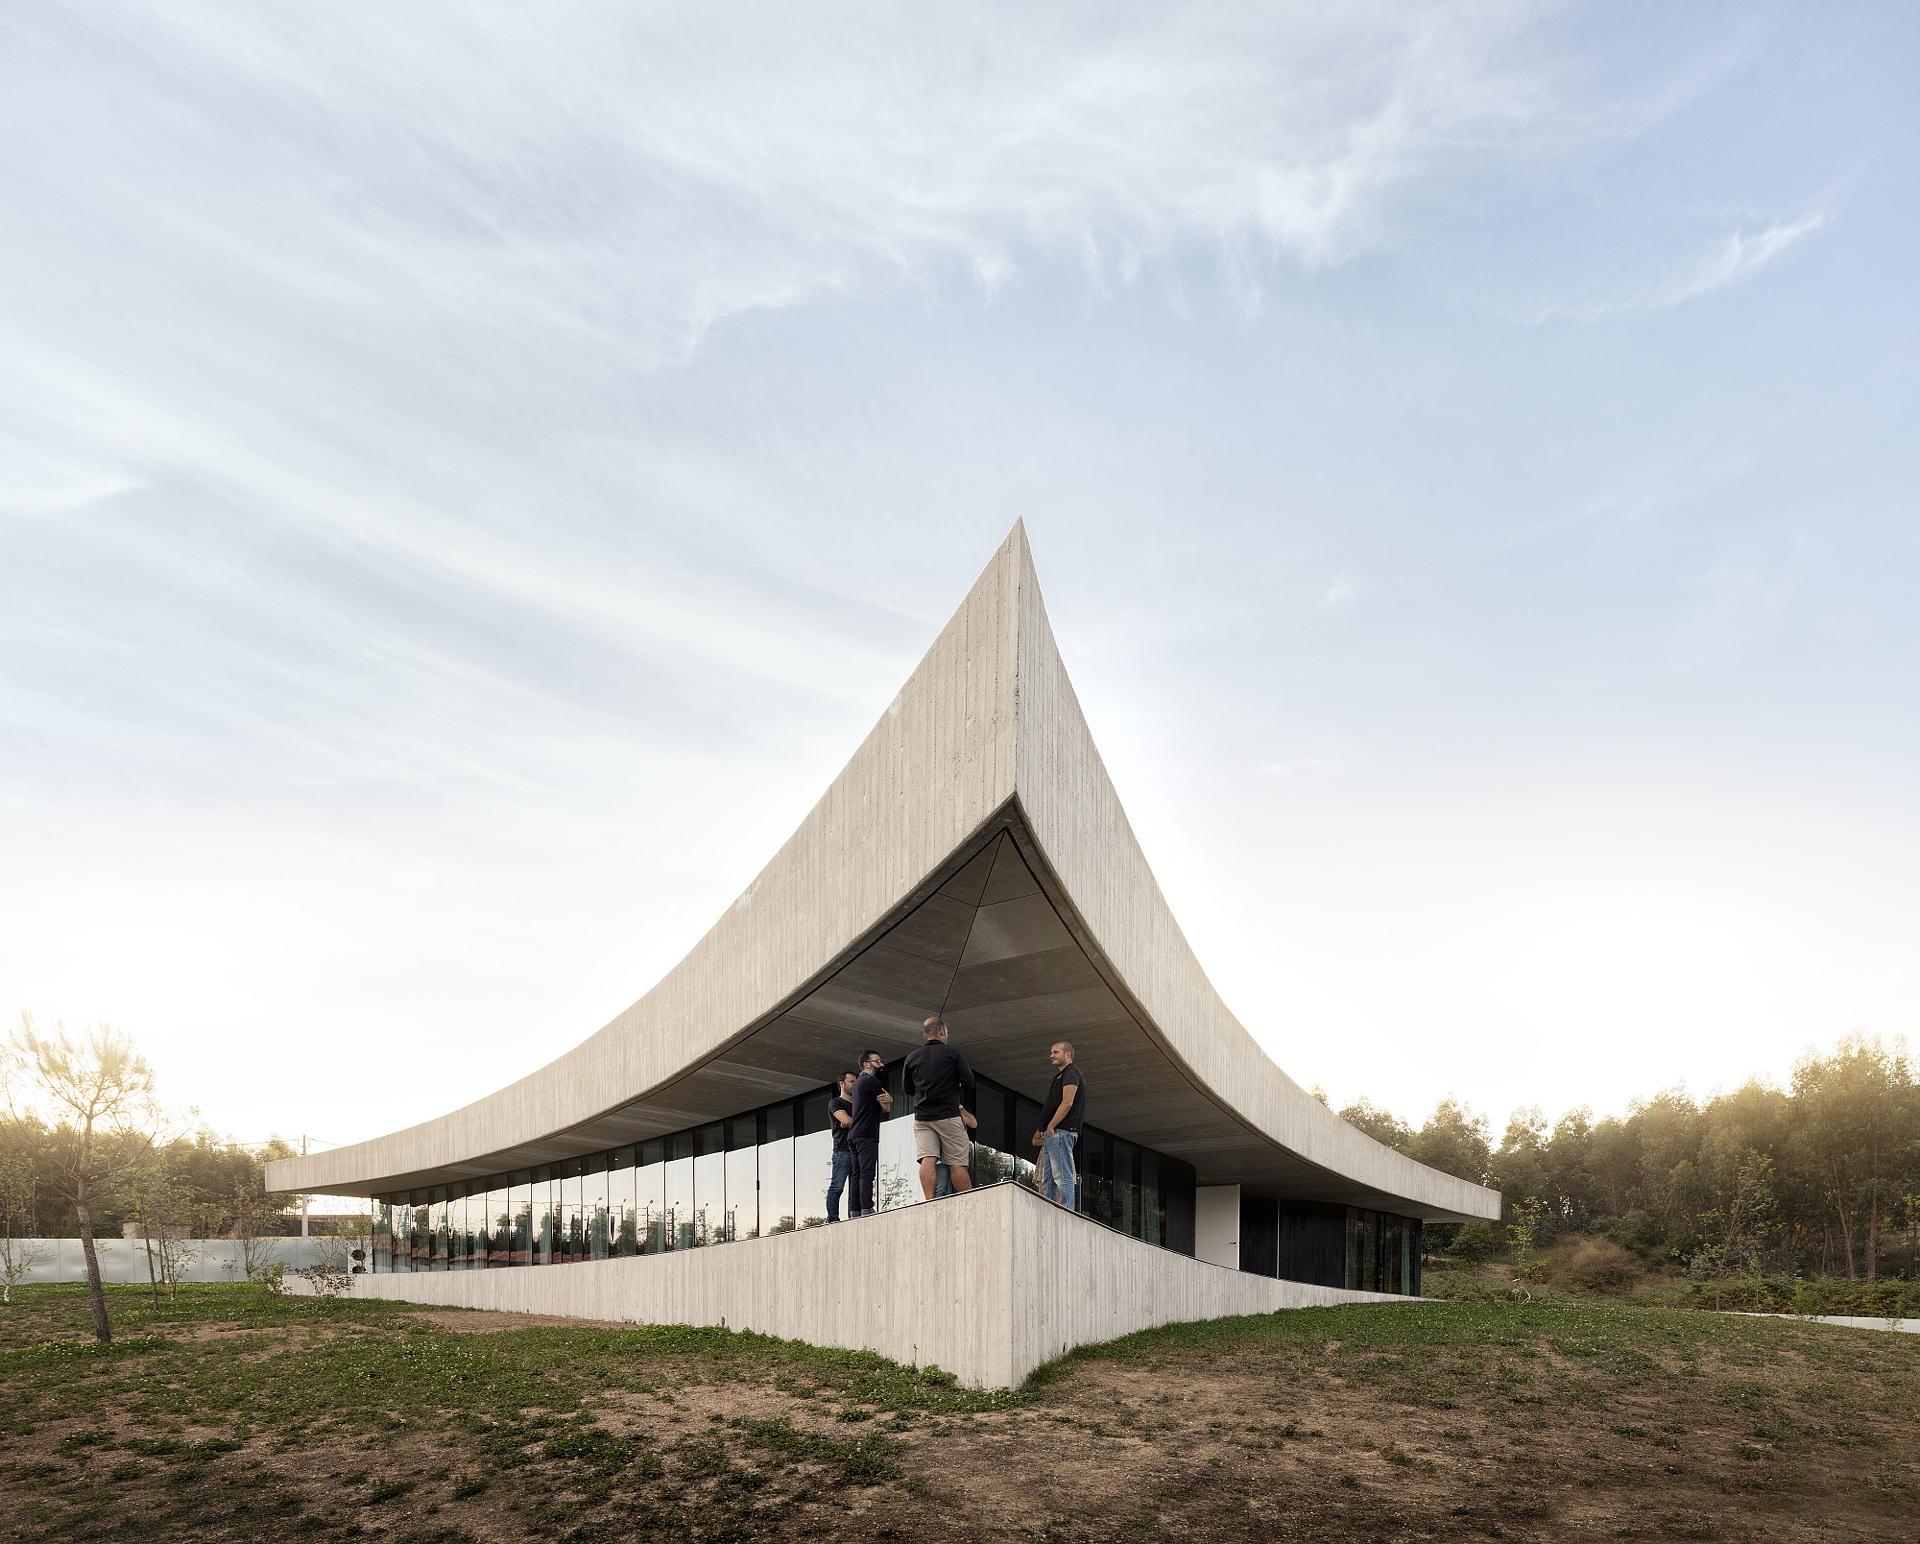 Spaceworkers' Casa Cabo de Vila in Paredes, Portugal